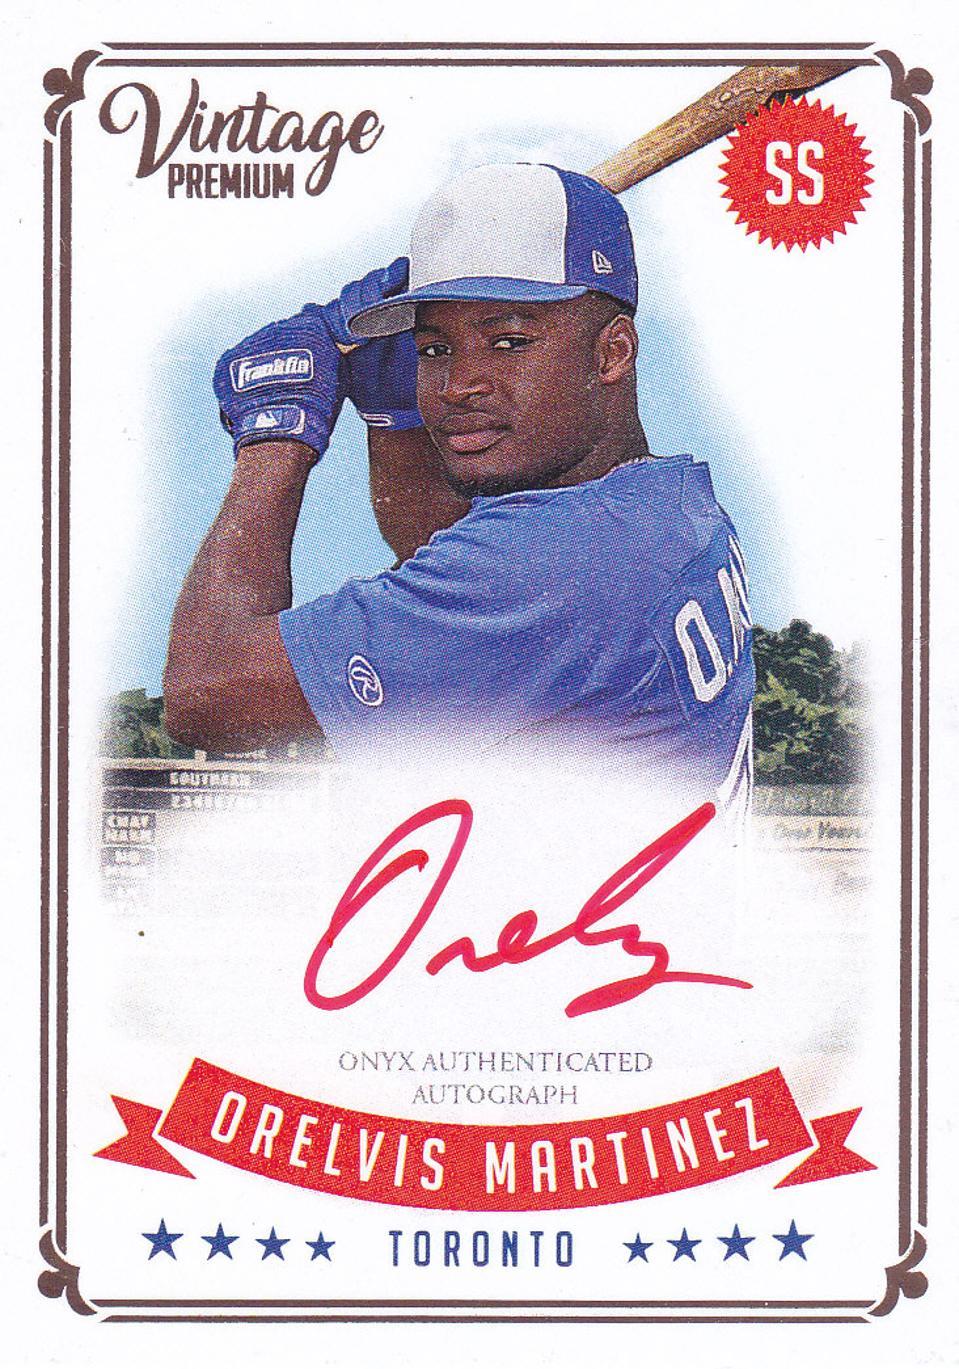 2020 Onyx Authenticated Vintage Premium Baseball Orelvis Martinez Red Autograph